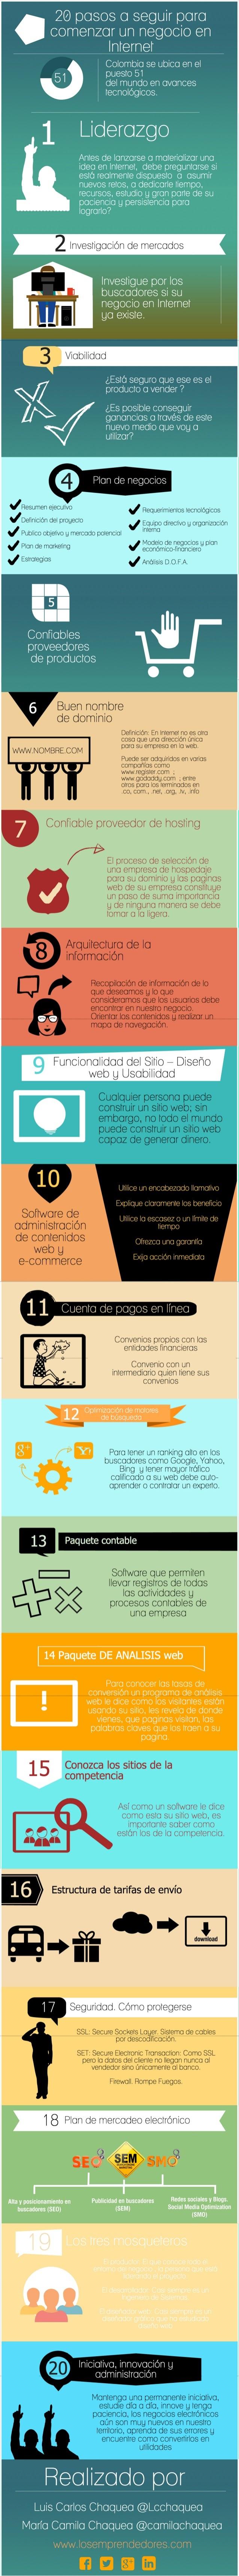 20 pasos a seguir para comenzar un negocio en internet (Infografía)